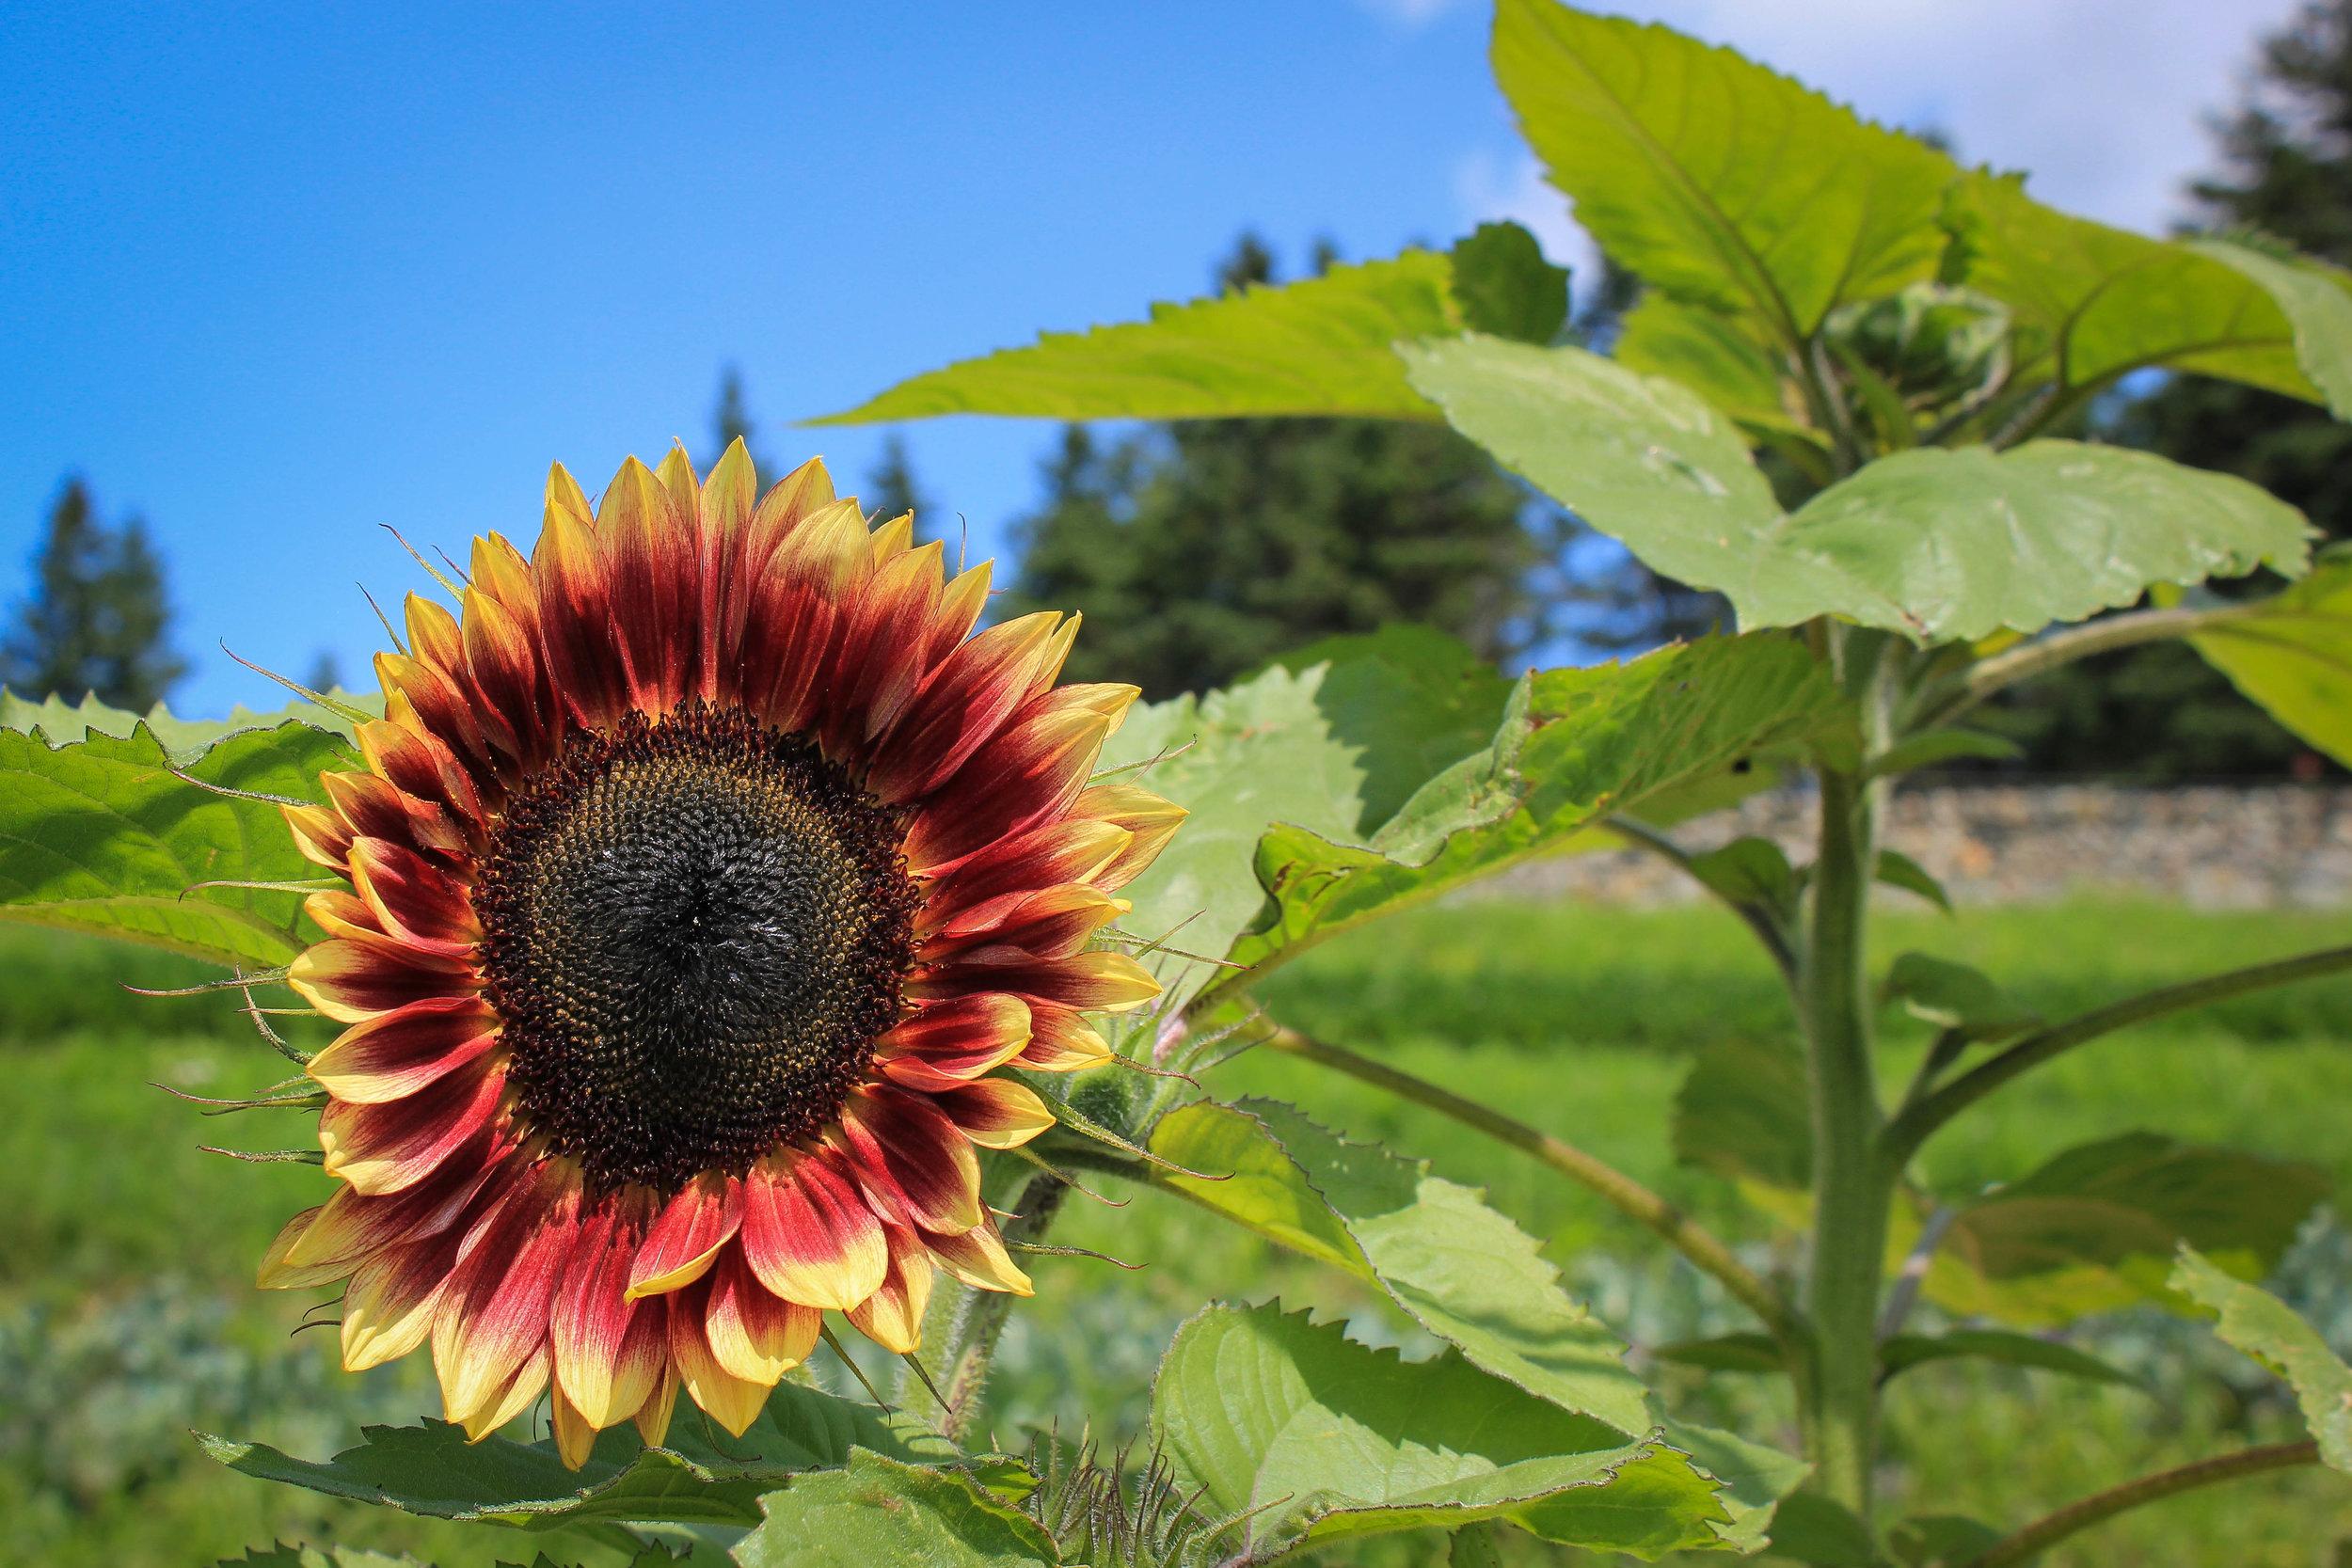 Turner Farm Sunflower